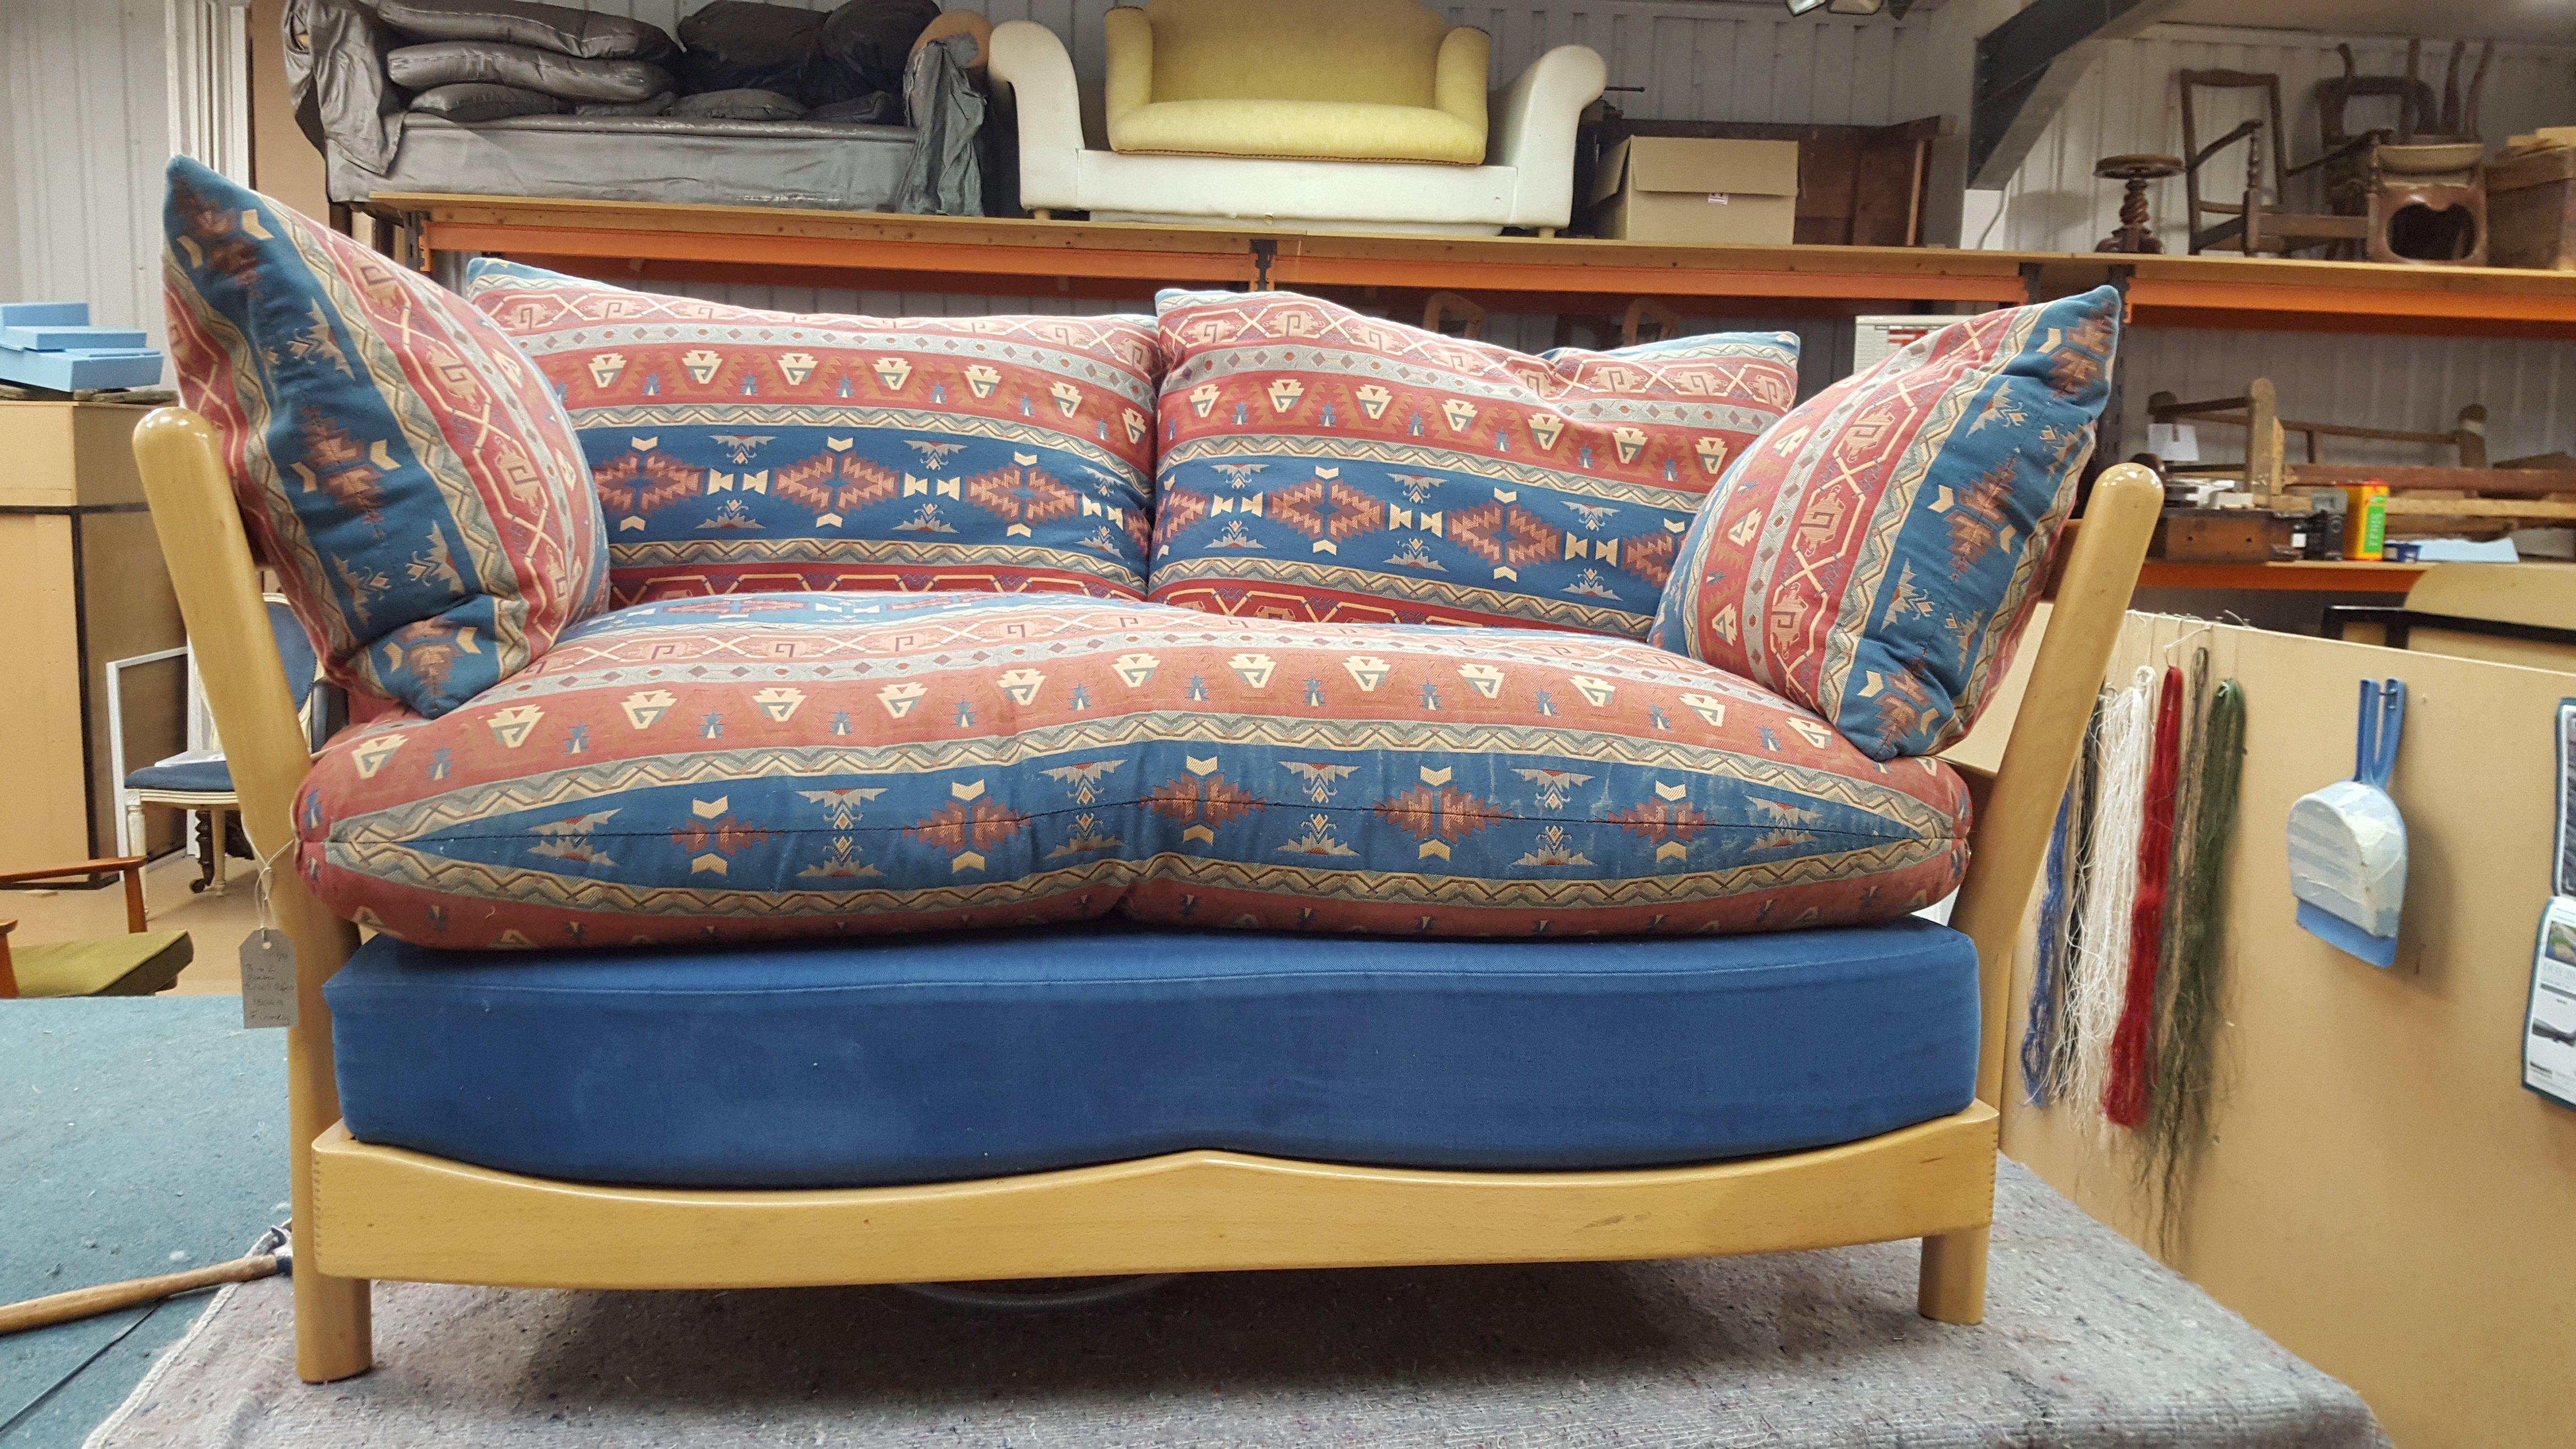 Un-restored couch